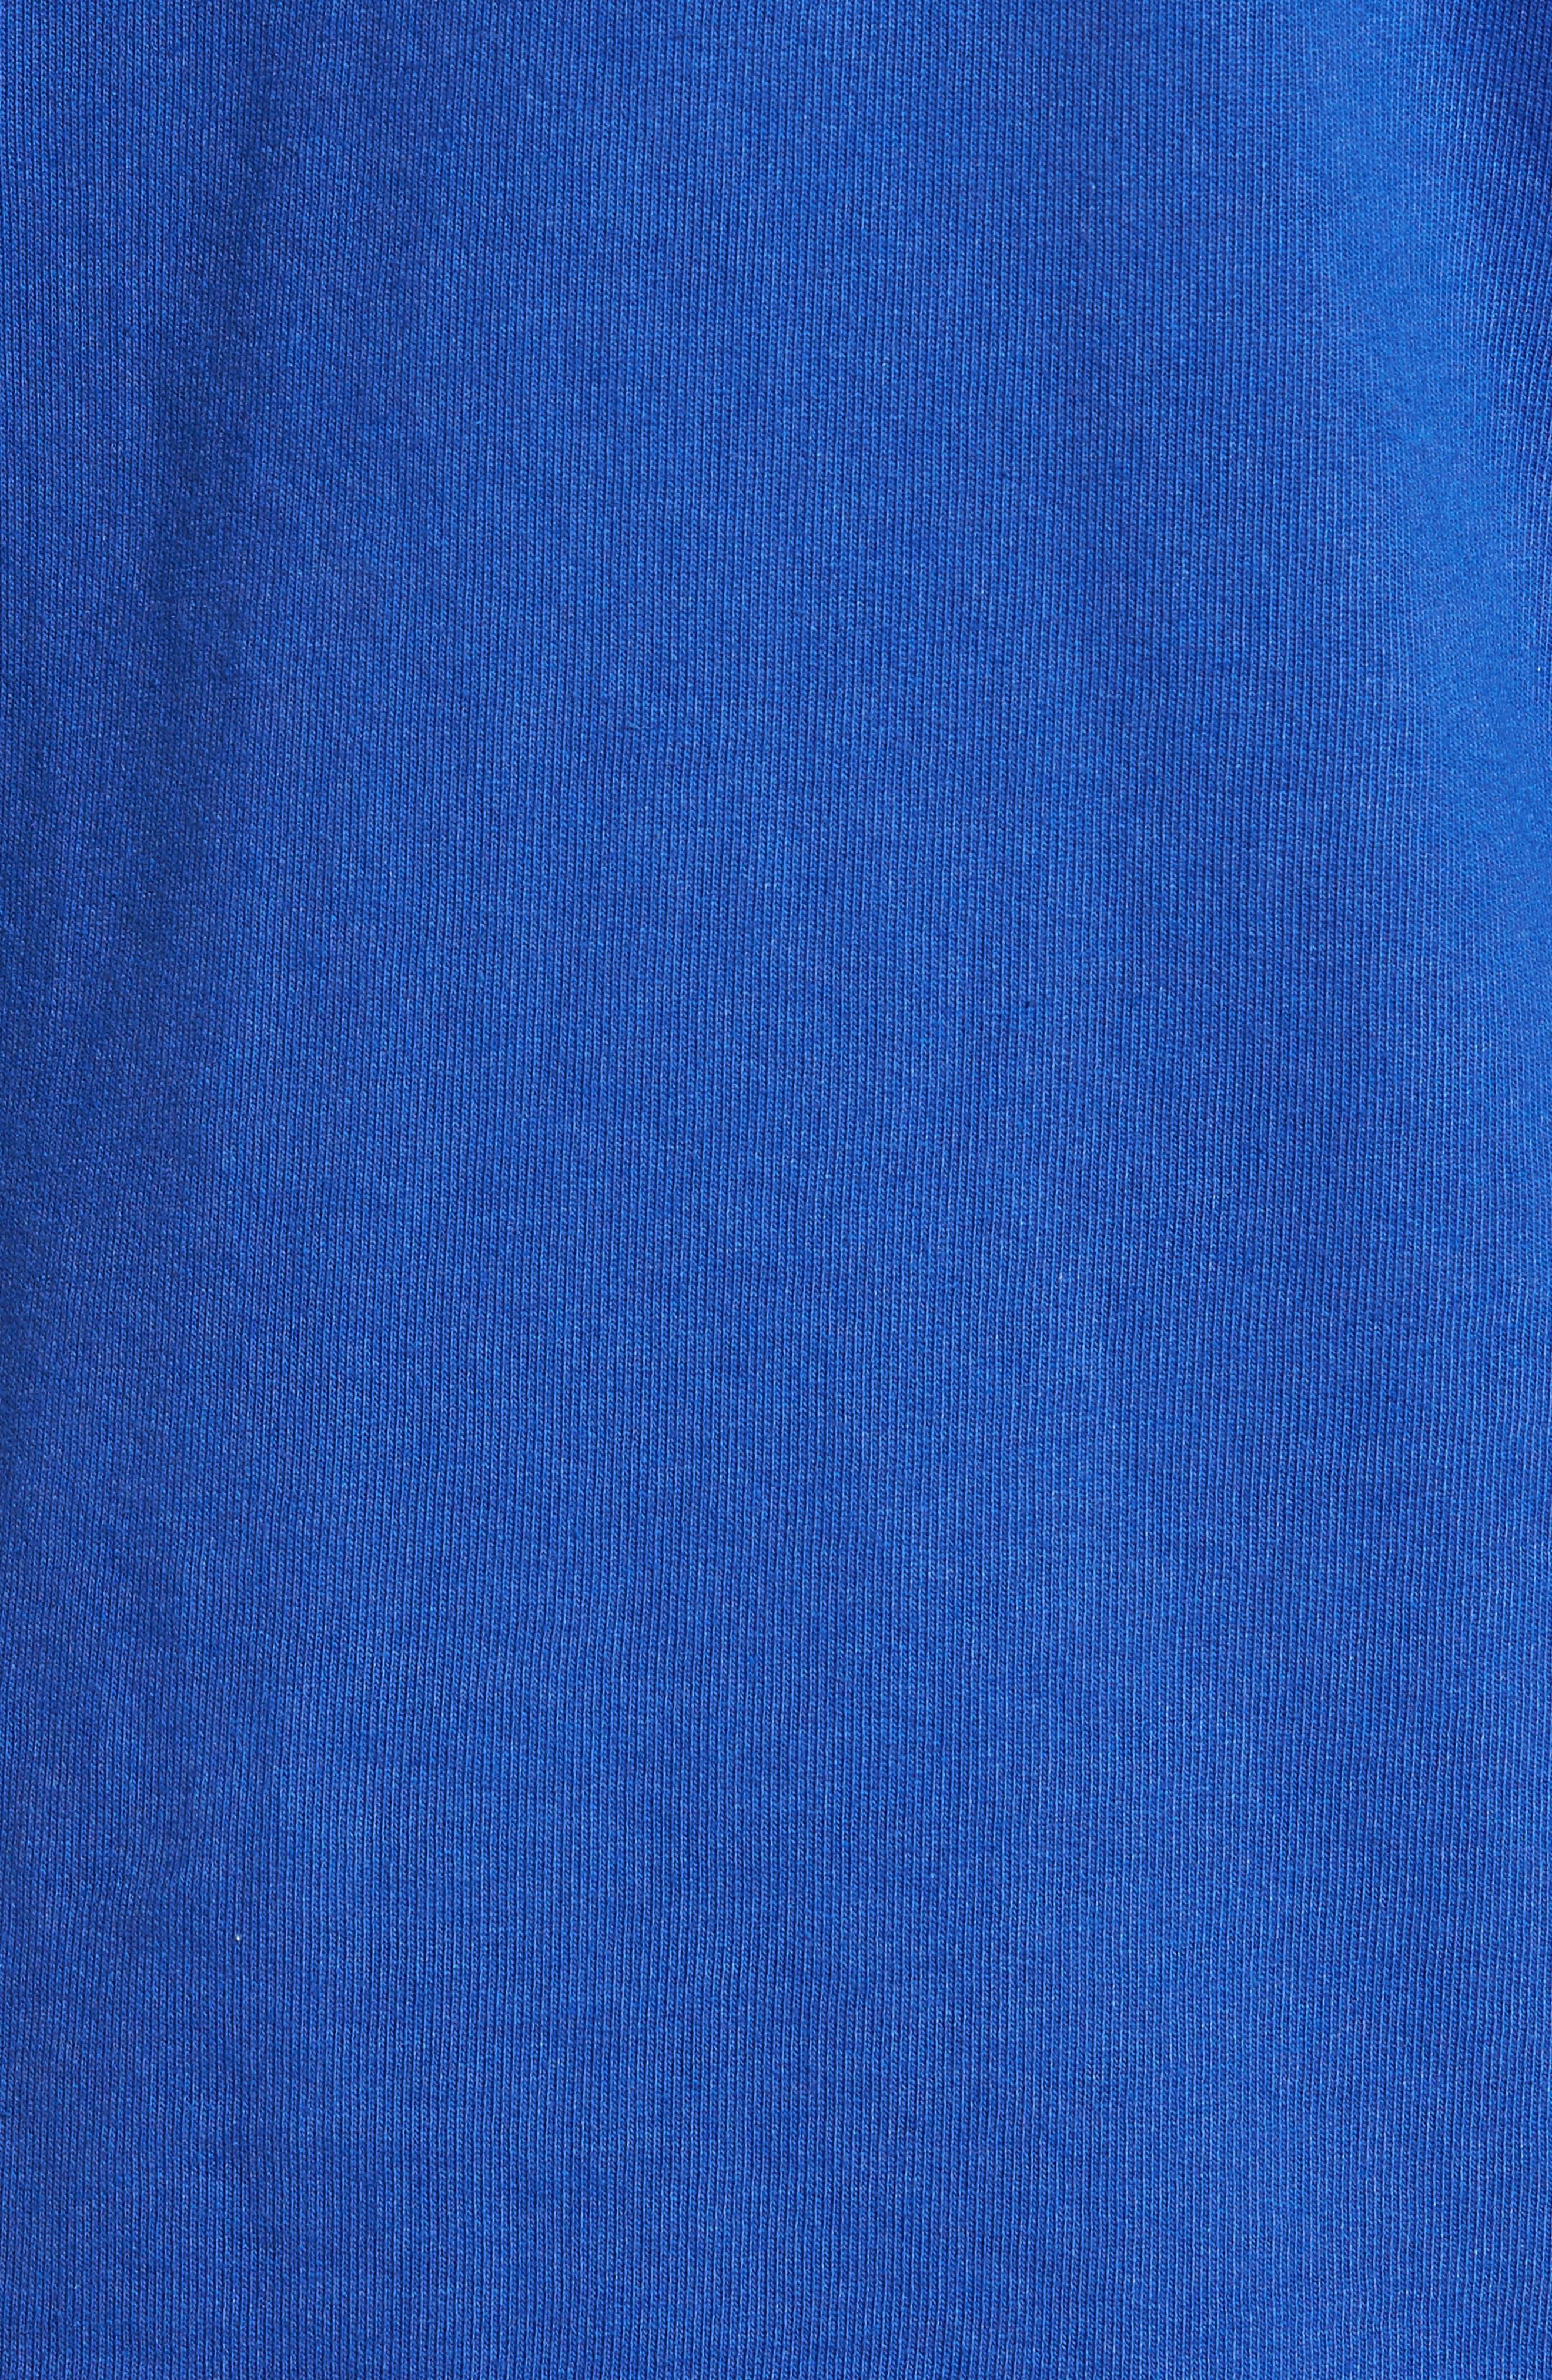 B-Side Reversible Crewneck Sweatshirt,                             Alternate thumbnail 34, color,